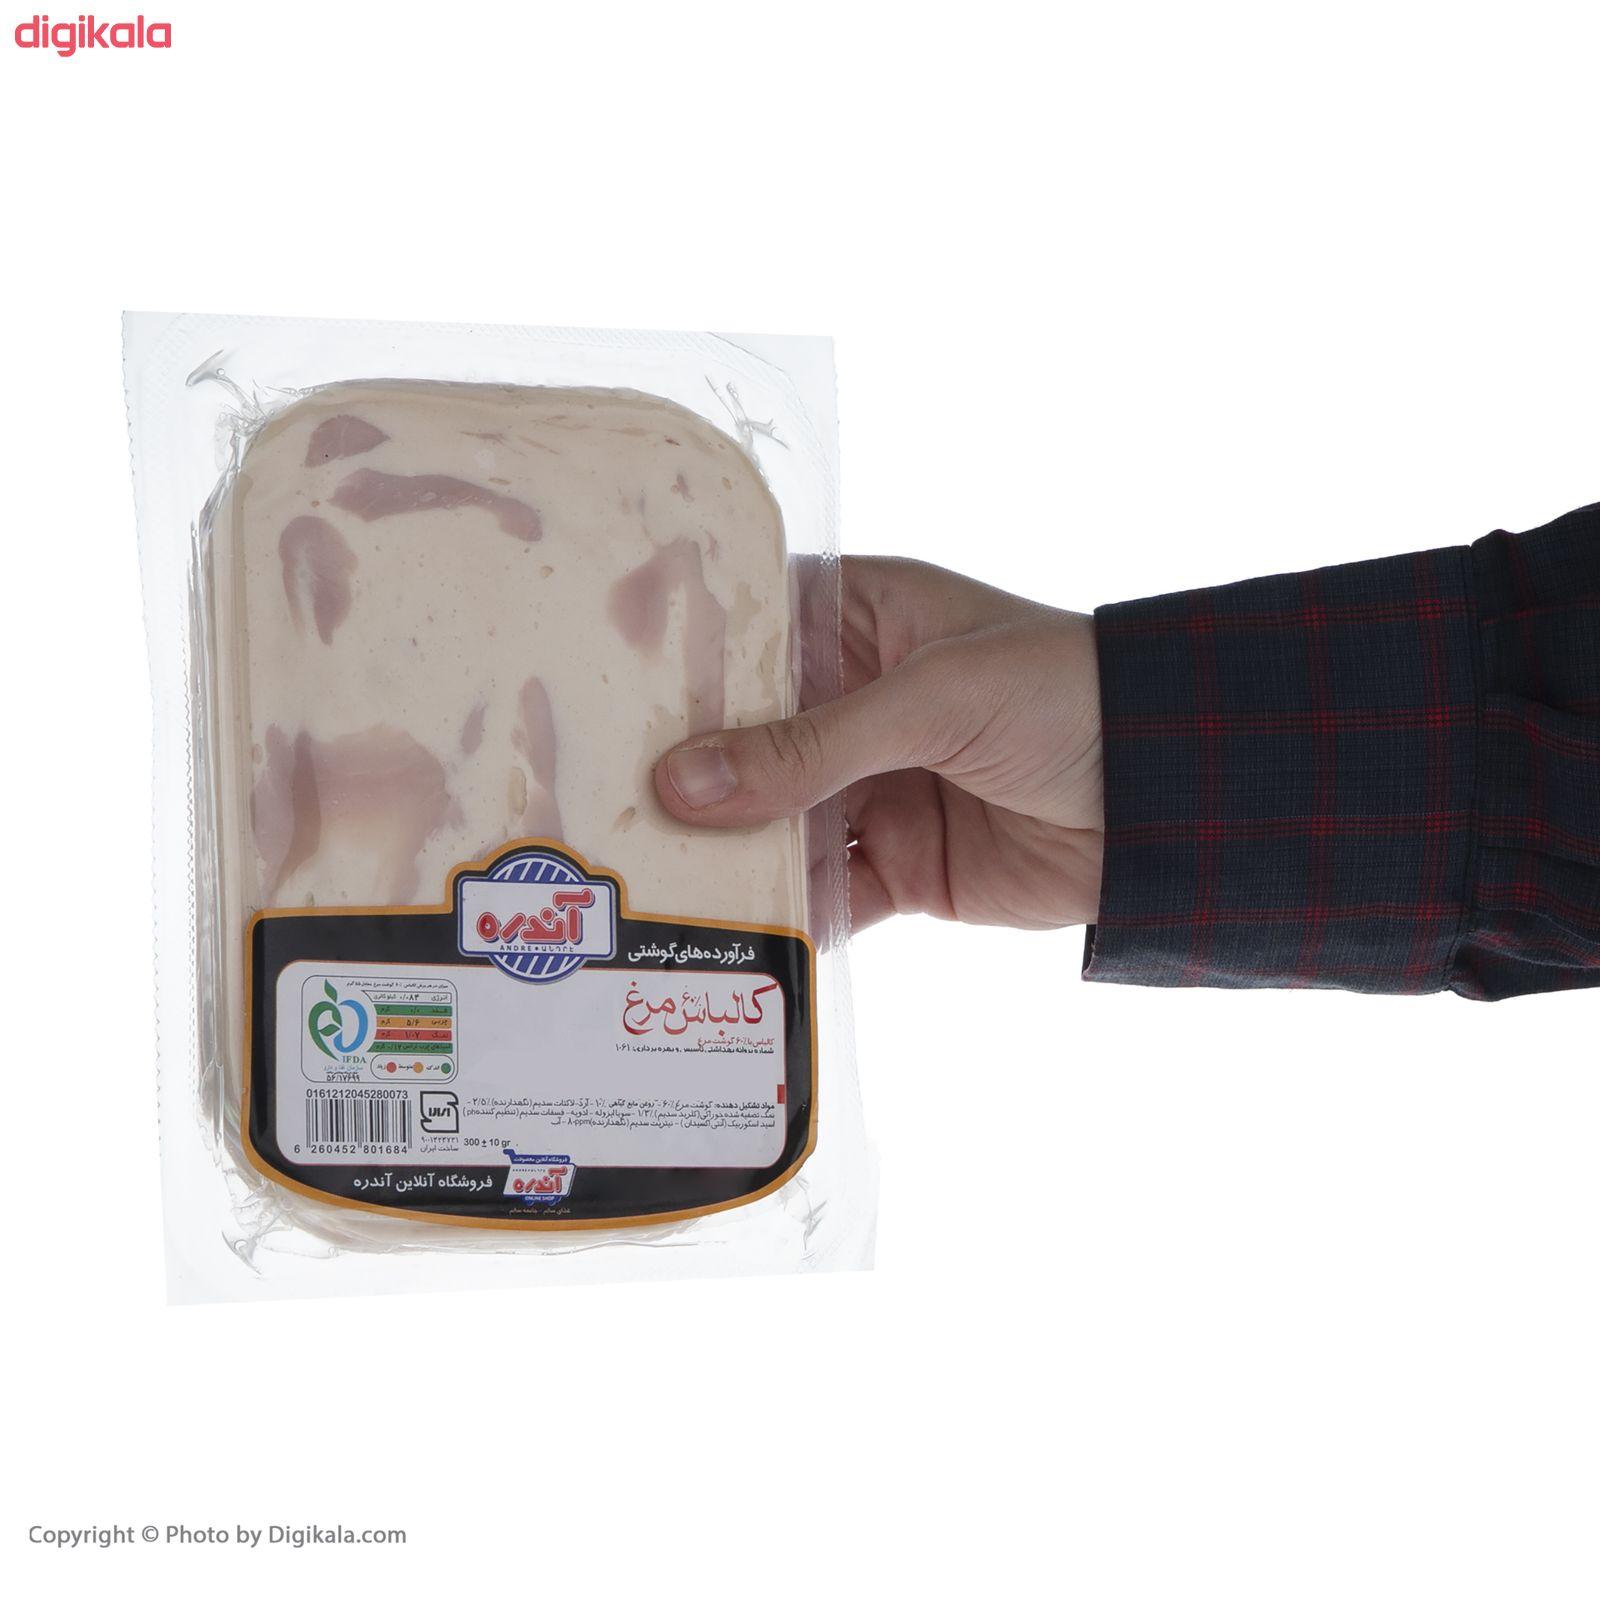 کالباس 60 درصد گوشت مرغ آندره - 300 گرم  main 1 2